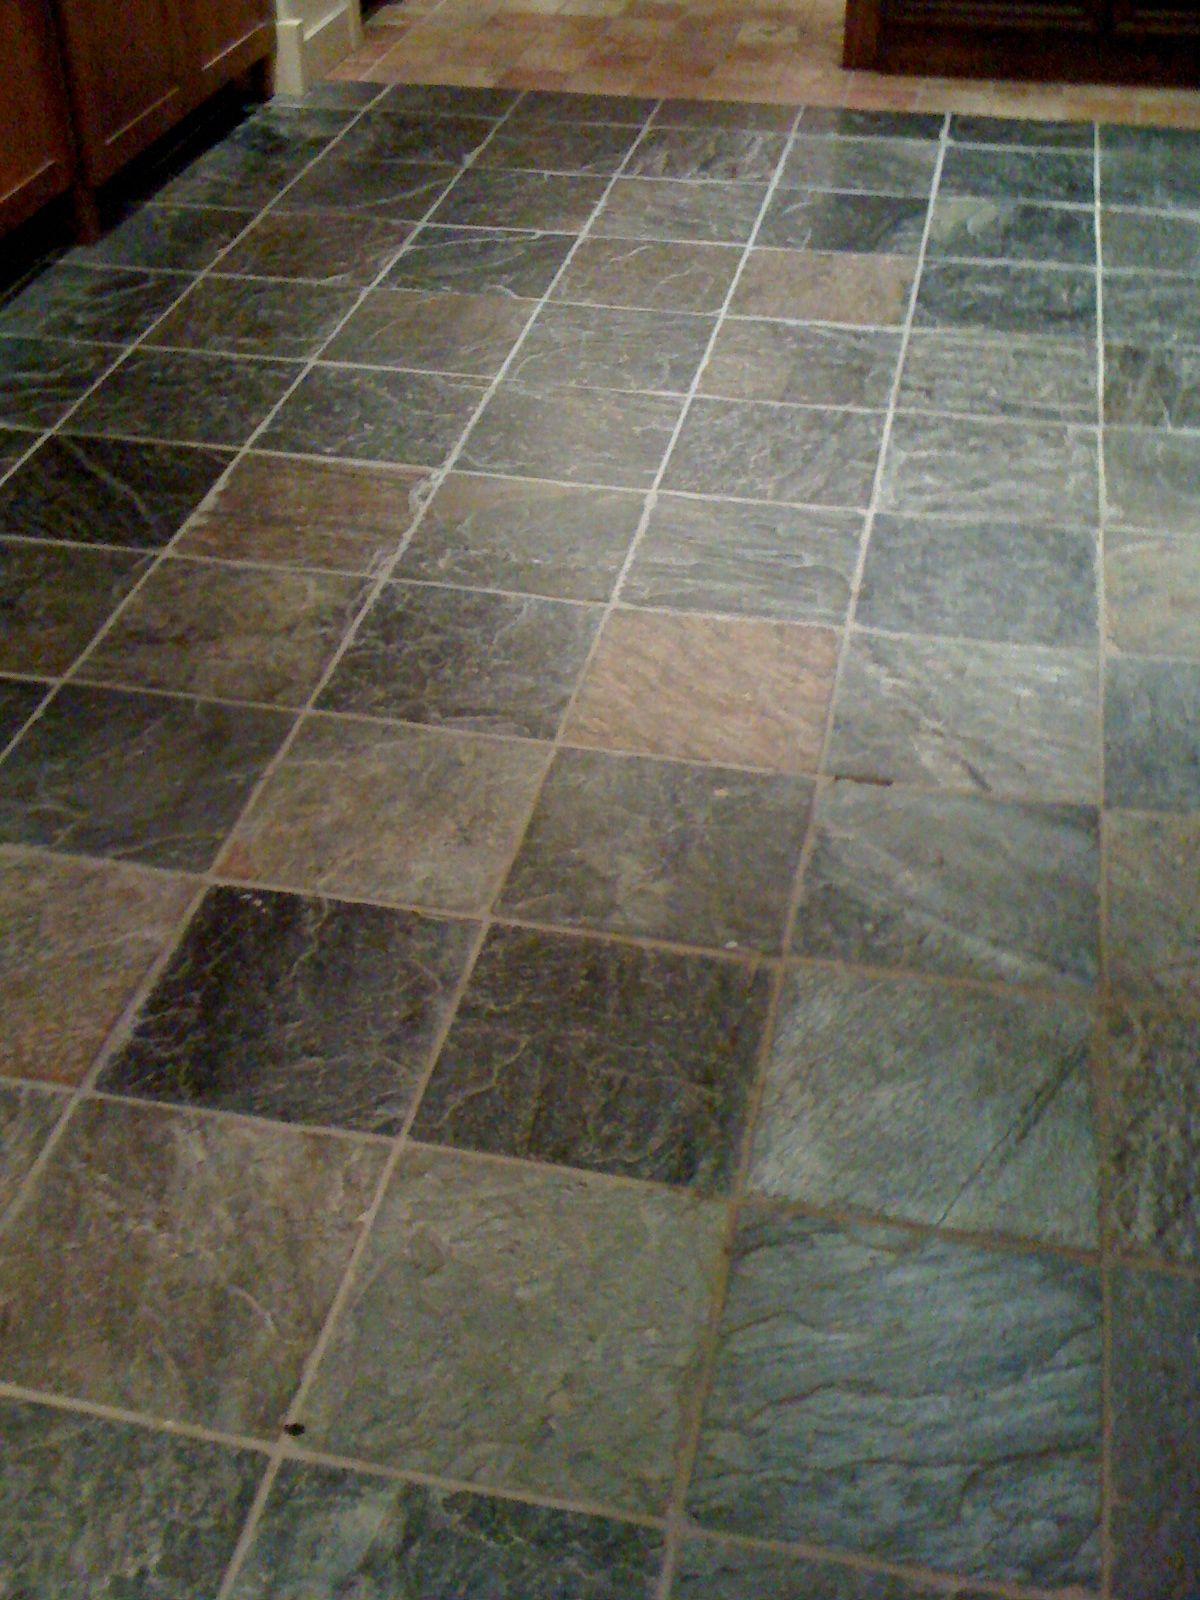 Slate tiles in bathroom - Bathroom Flooring Slate Tile